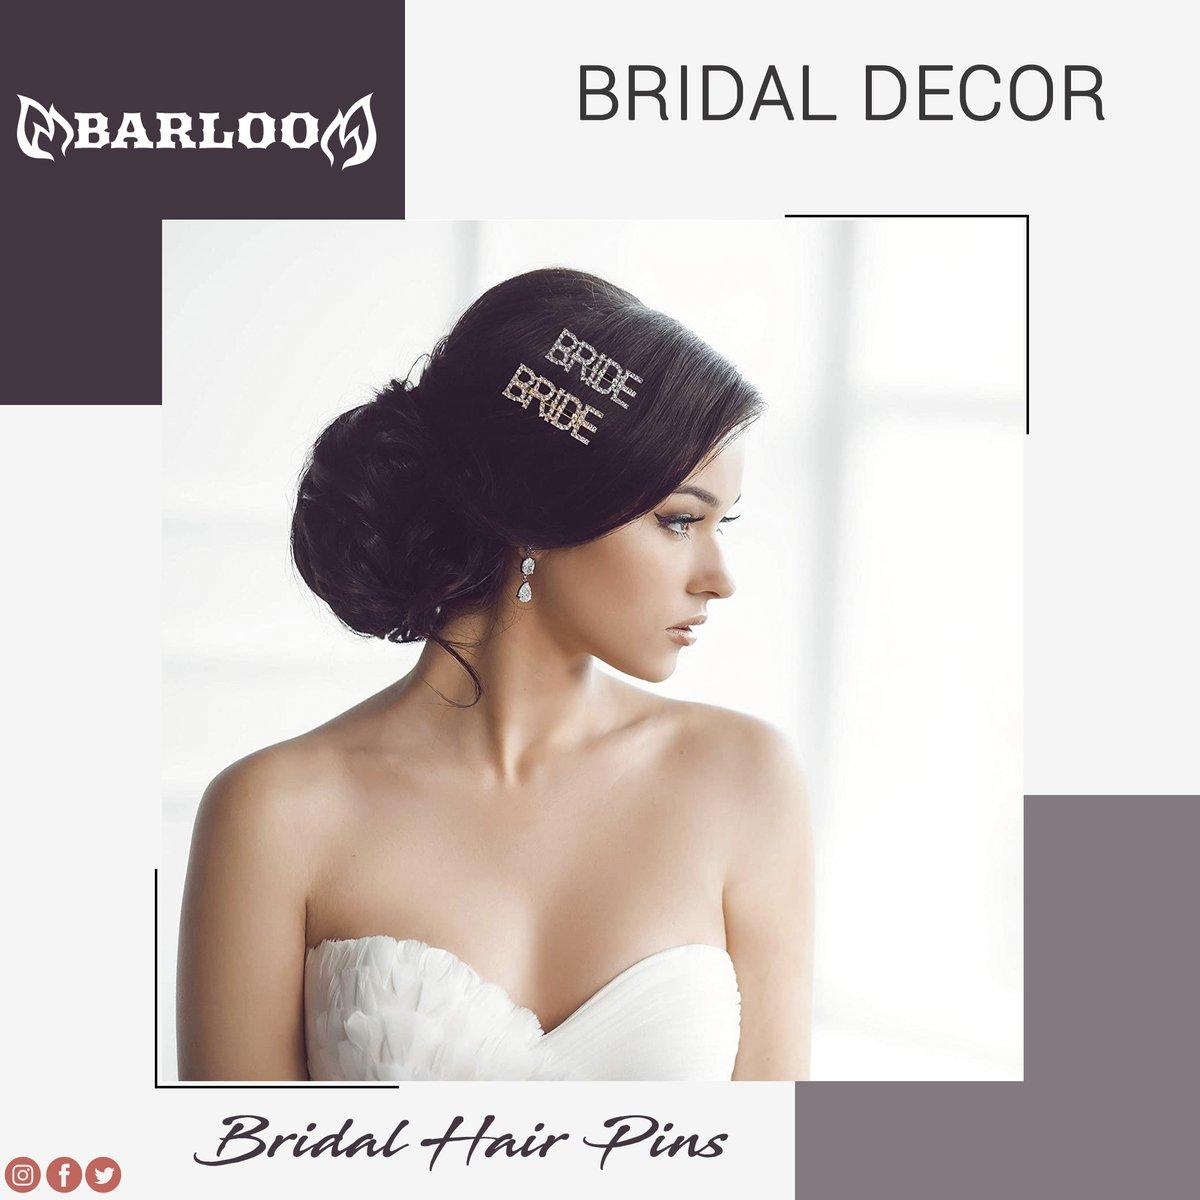 𝐁𝐫𝐢𝐝𝐚𝐥 𝐇𝐚𝐢𝐫 𝐏𝐢𝐧𝐬  SILVER & GOLD RHINESTONE WORD HAIR CLIP ENCHANTING FEEL IDEAL & PERFECT GIFT  Shop now:   Enter promo code for 10% off: 𝟏𝟎𝐂𝐉𝐁𝐙𝐊𝐕  #Barloo #BridalHair #pins #wedding #games #decor #OOTT #OOTD #OTD #fun #hair #StayGold